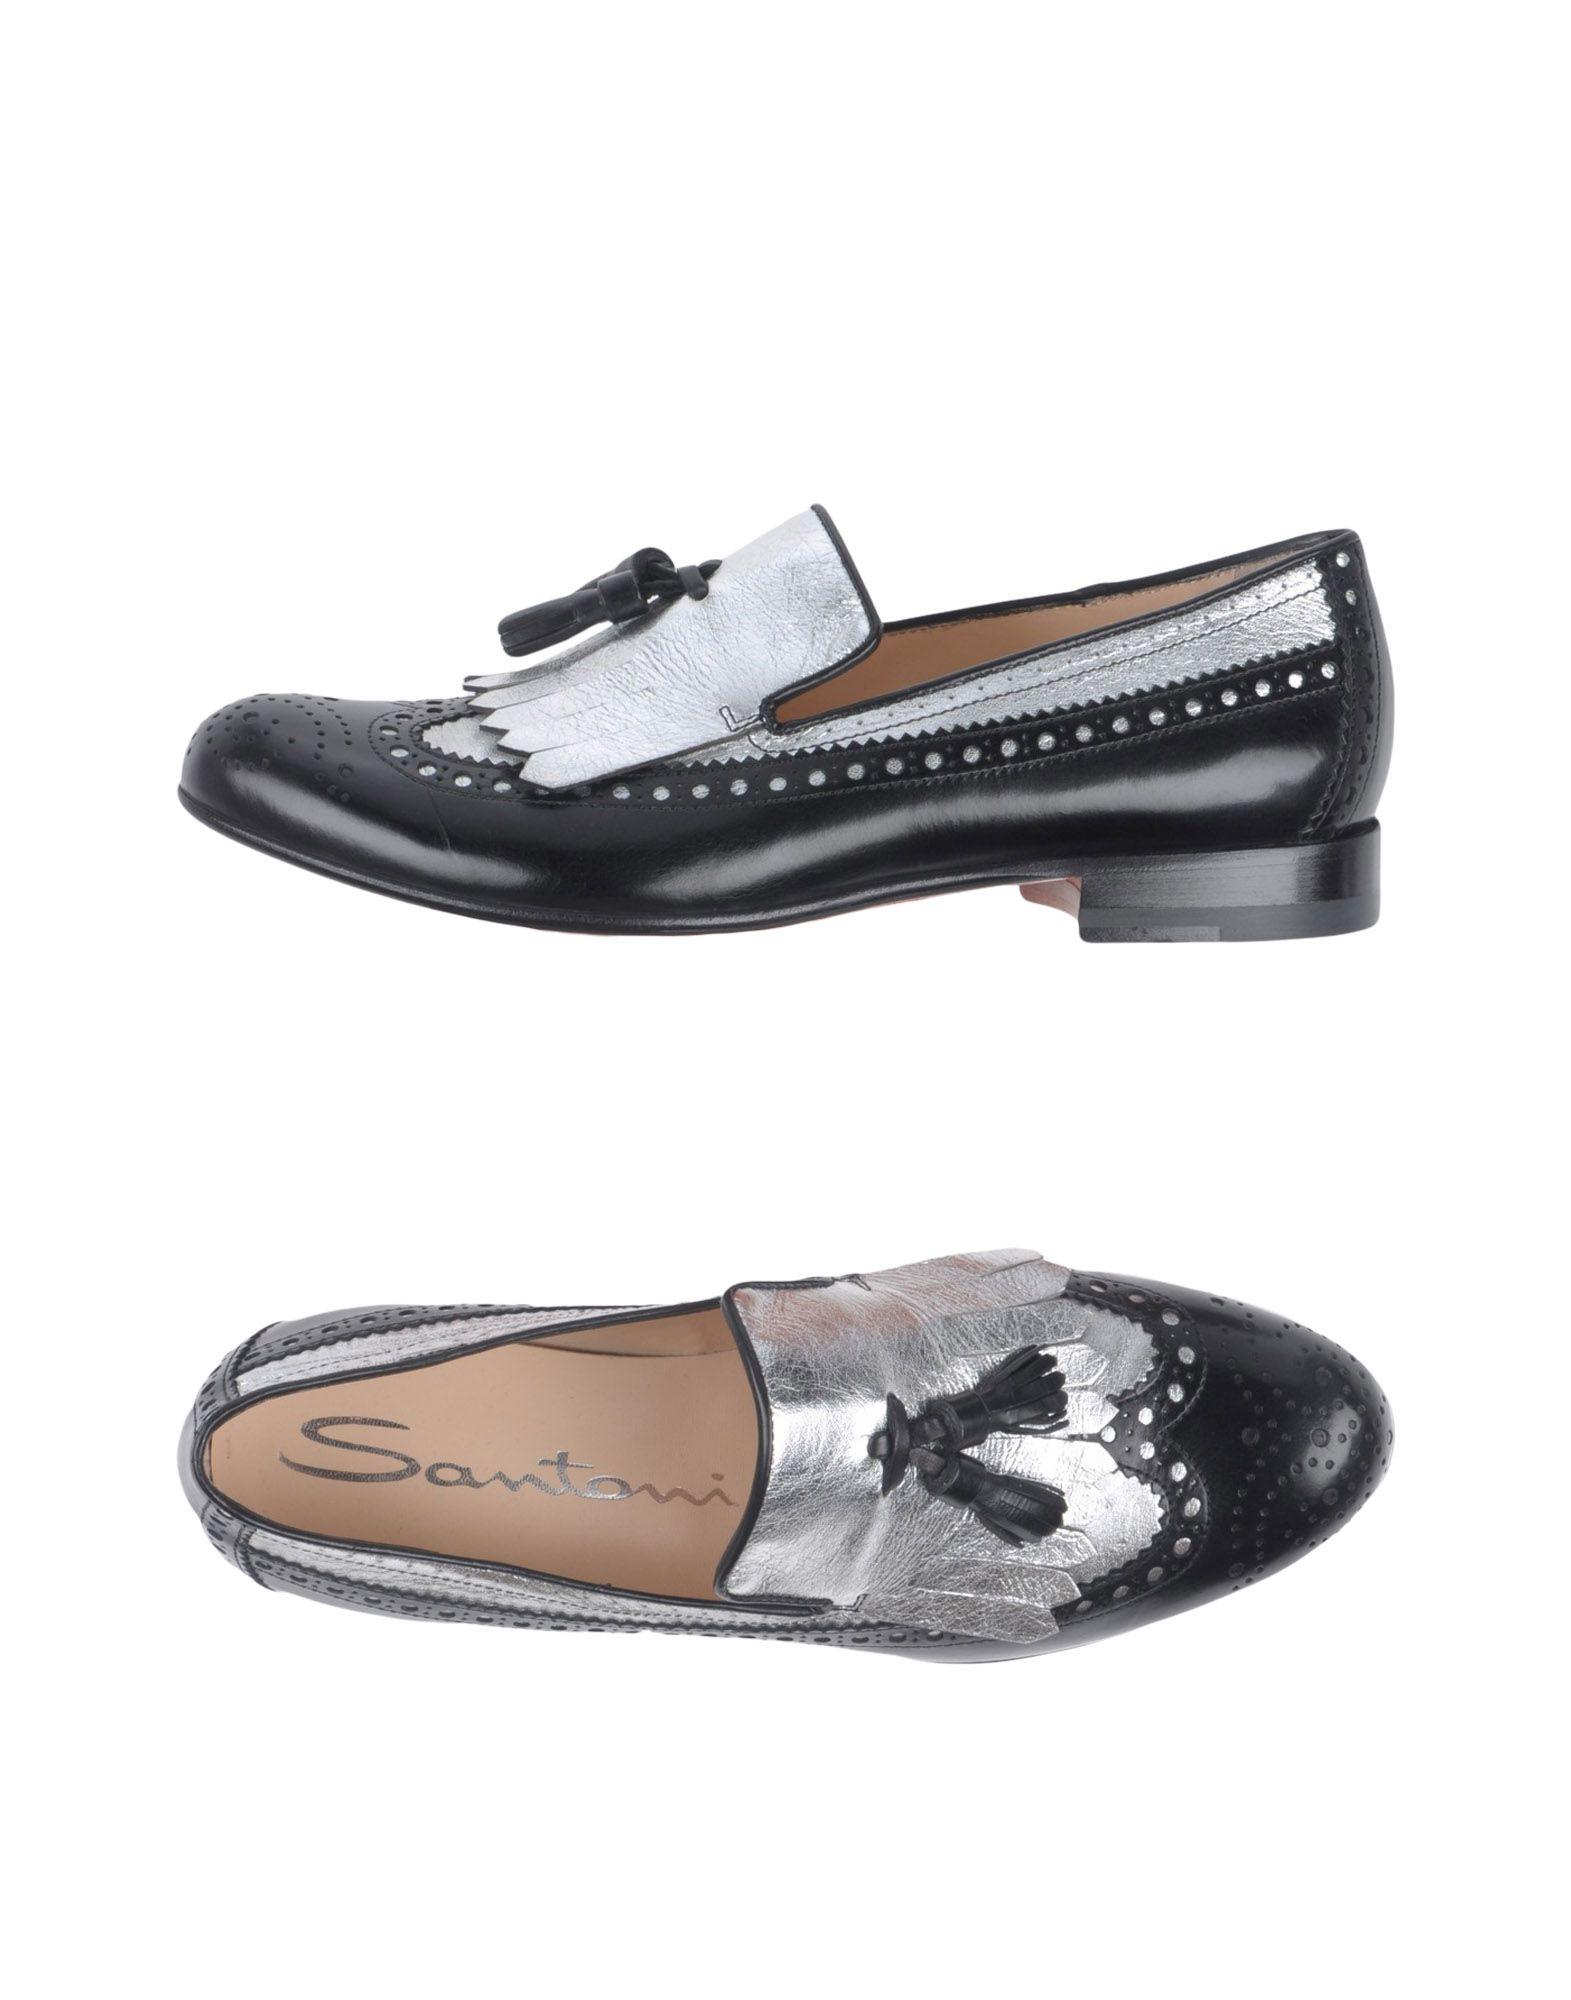 Santoni Mokassins strapazierfähige Damen  11387400JMGut aussehende strapazierfähige Mokassins Schuhe 845269